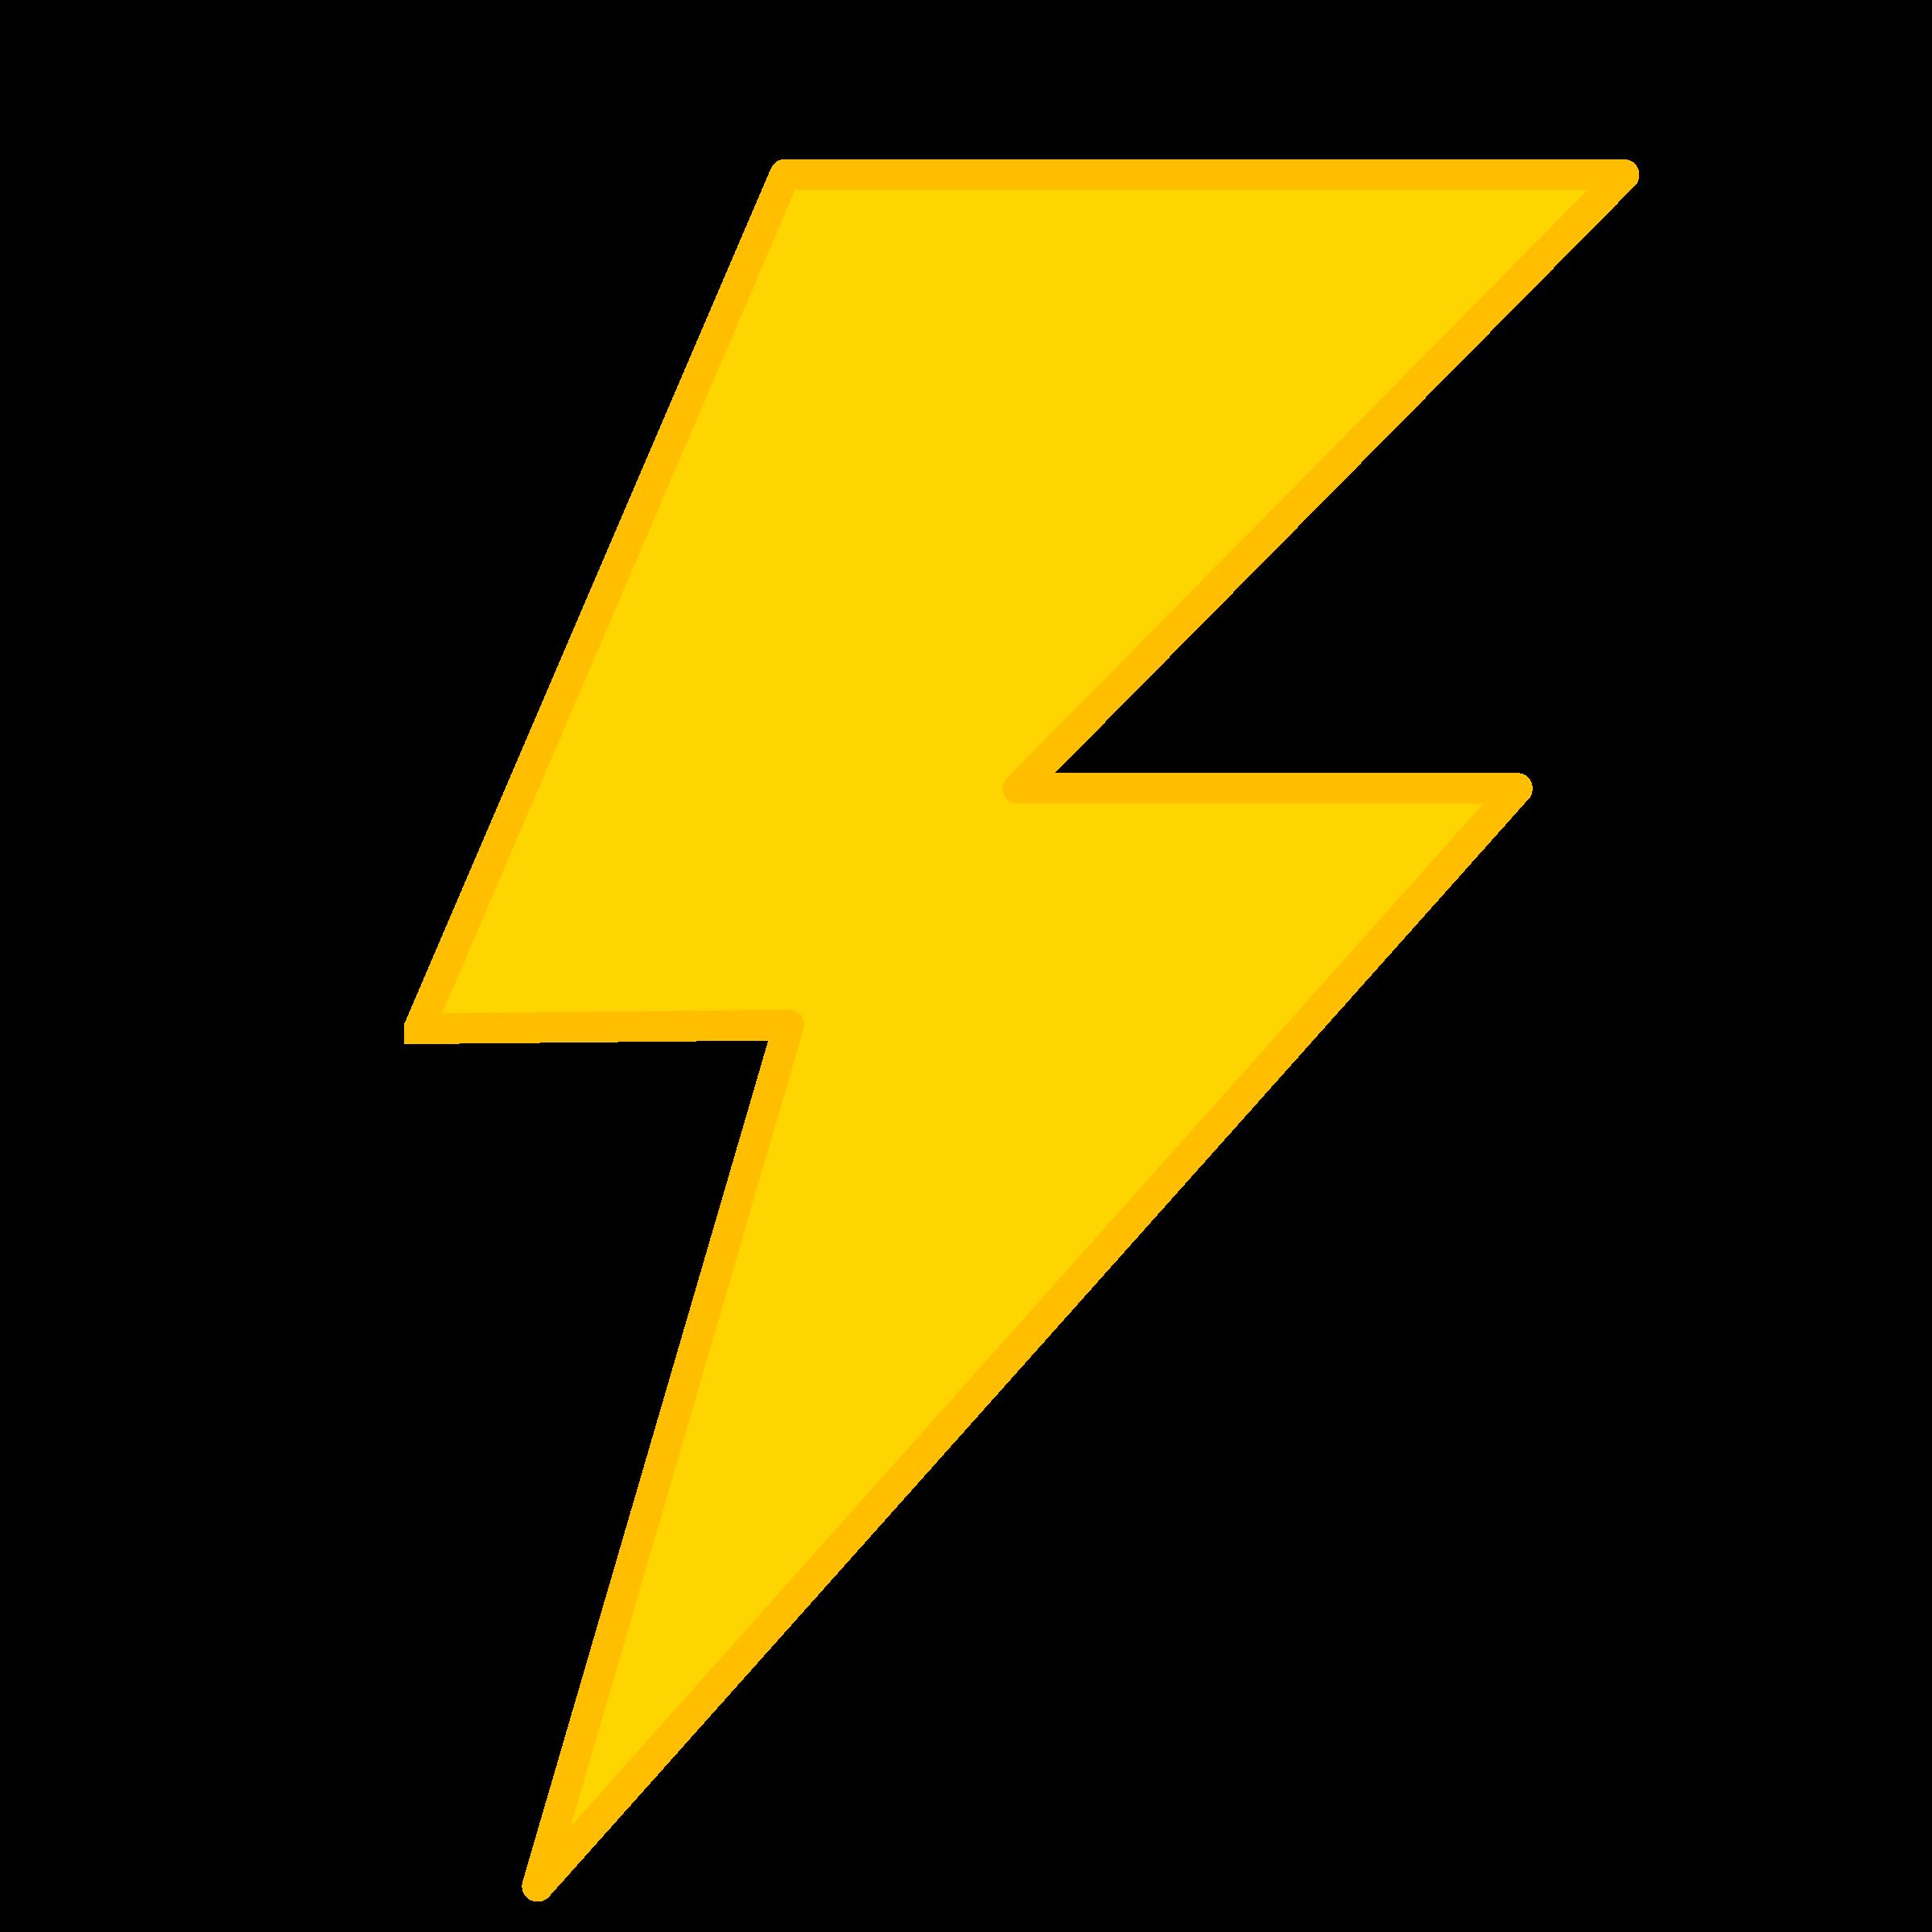 Cartoon Lighting Bolt Clipart